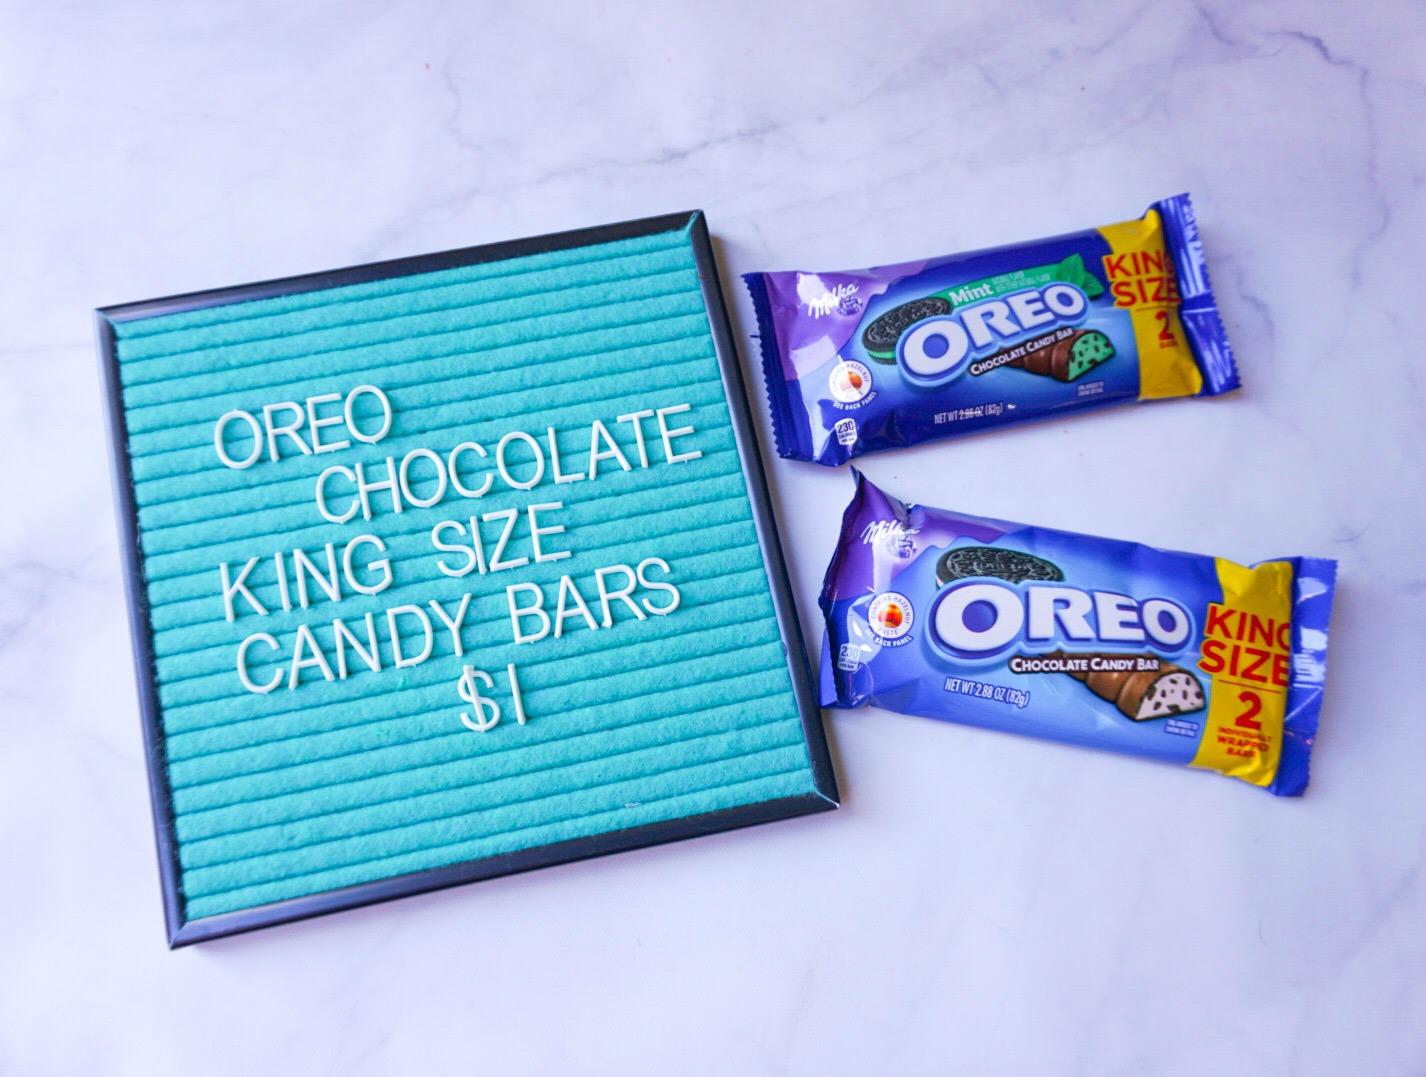 Fullsize Of Oreo Chocolate Candy Bar